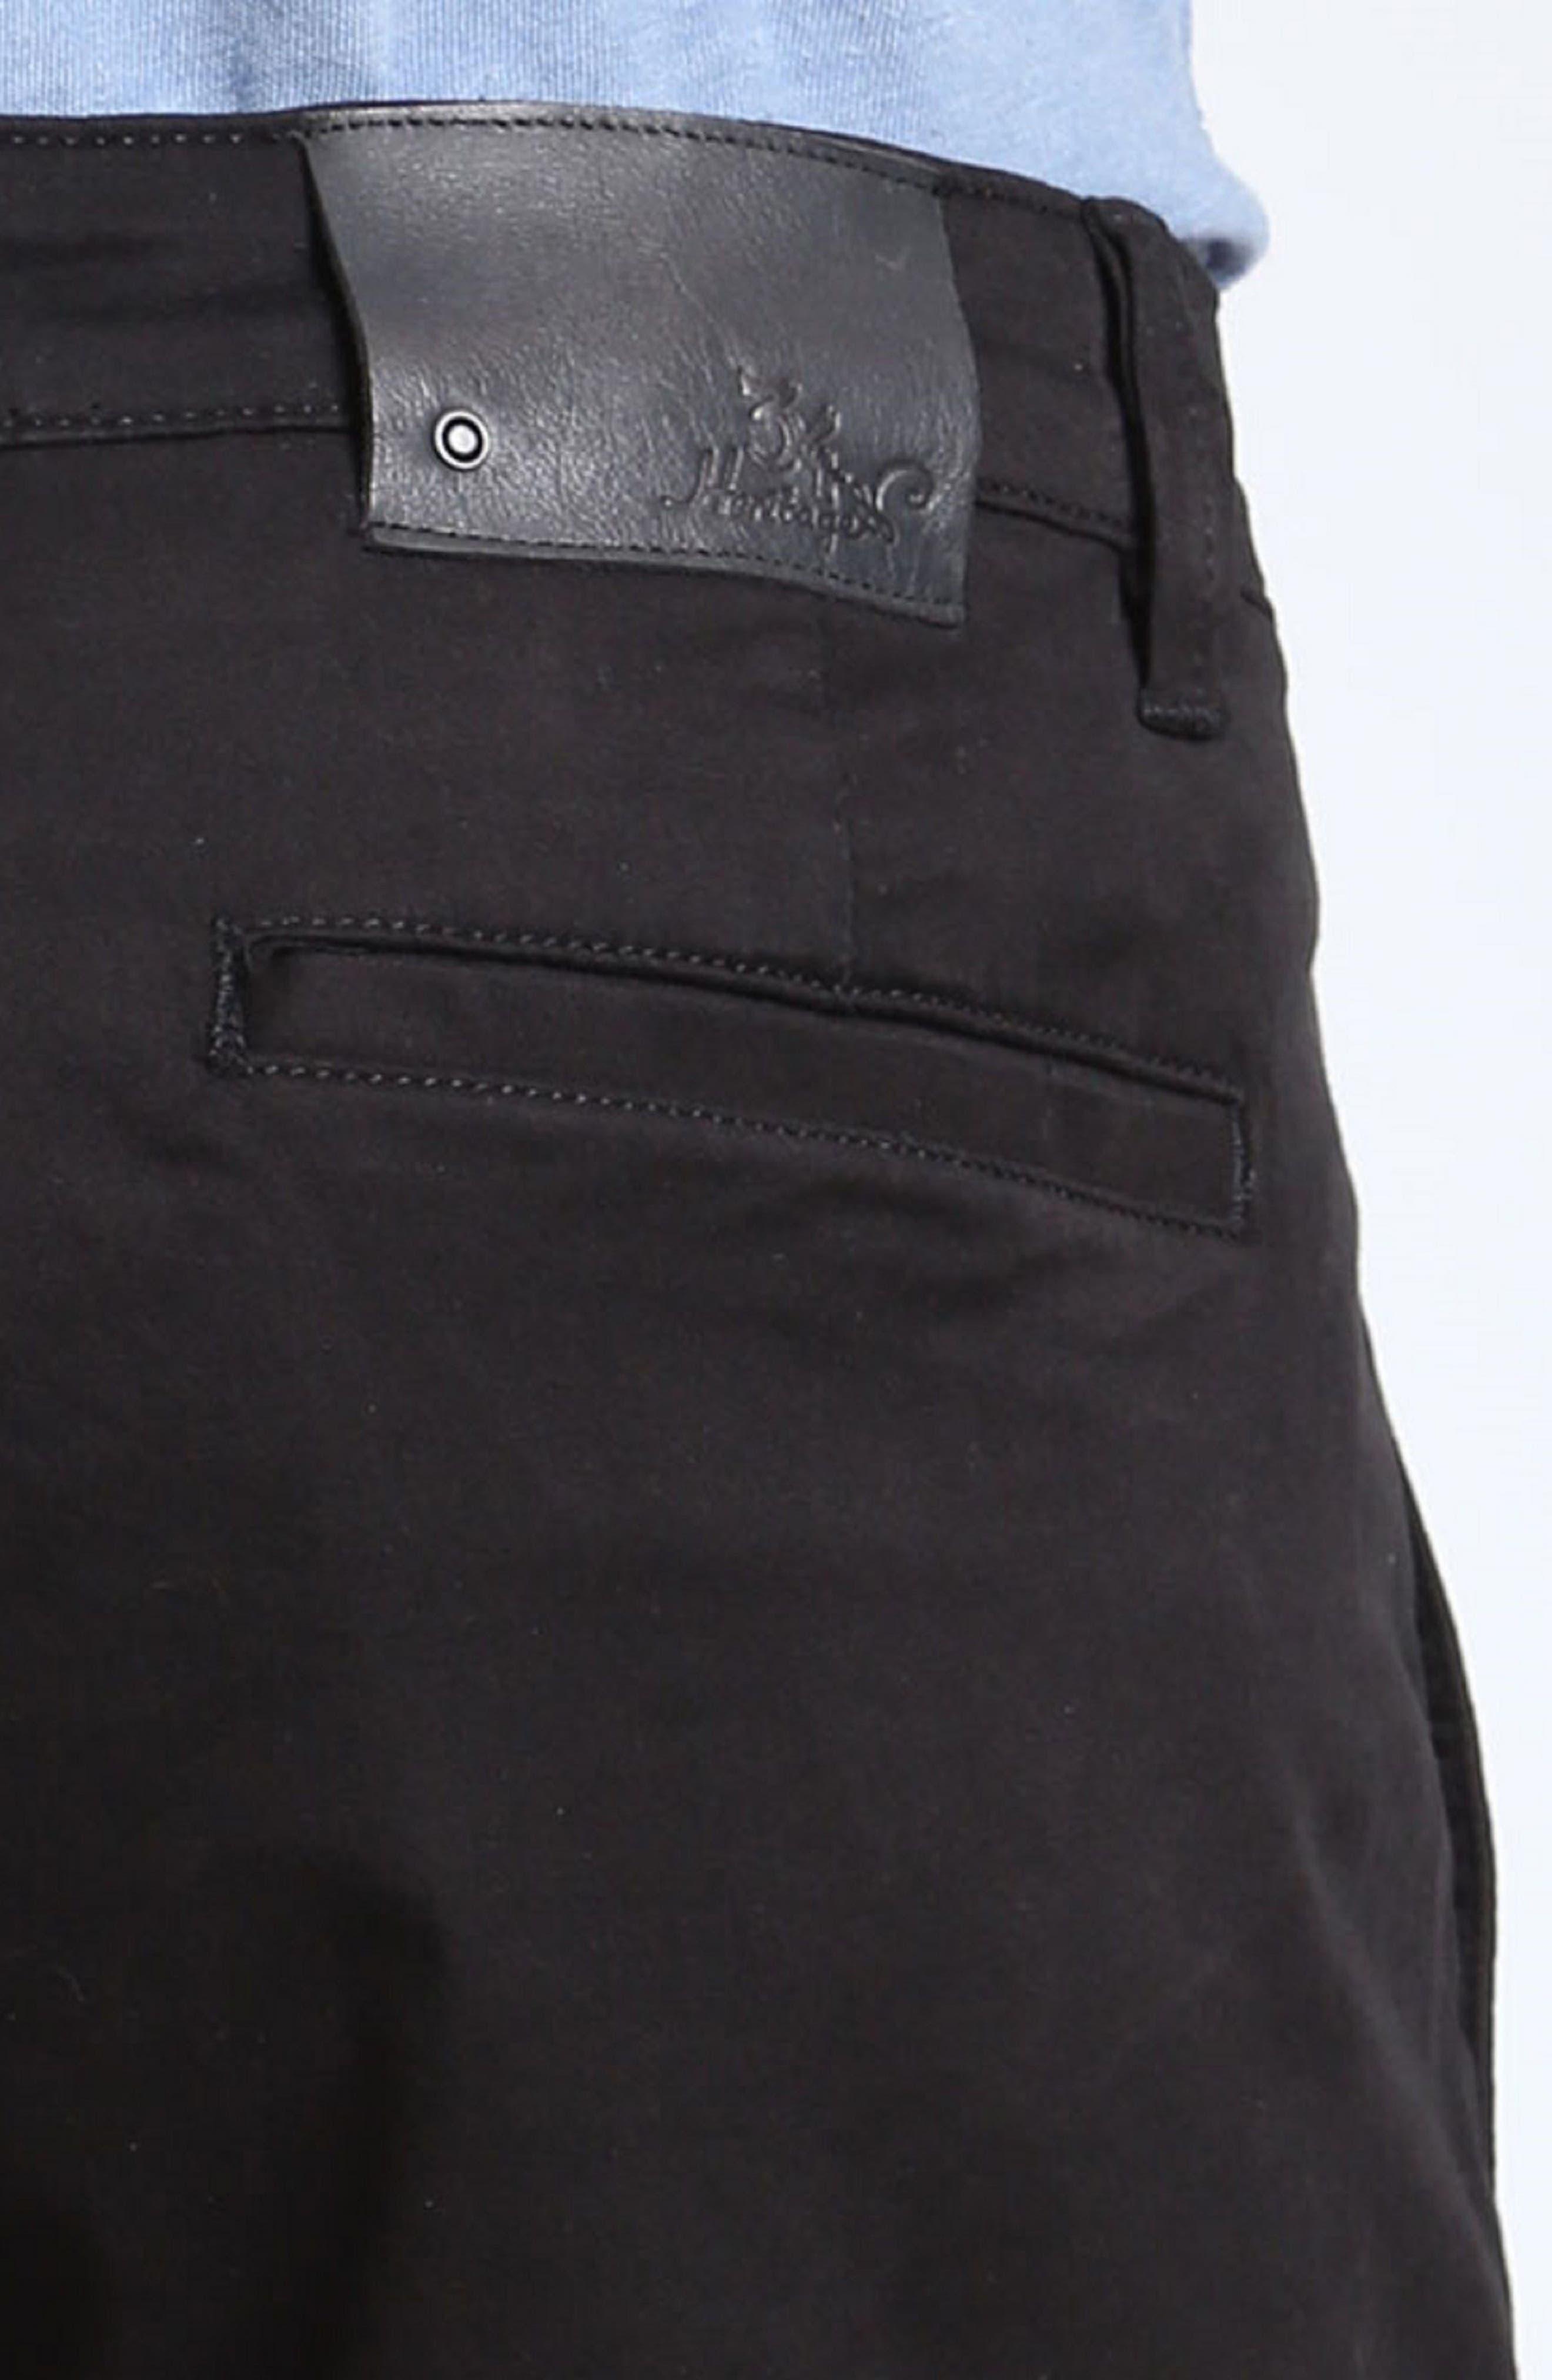 Nevada Twill Shorts,                             Alternate thumbnail 4, color,                             BLACK TWILL